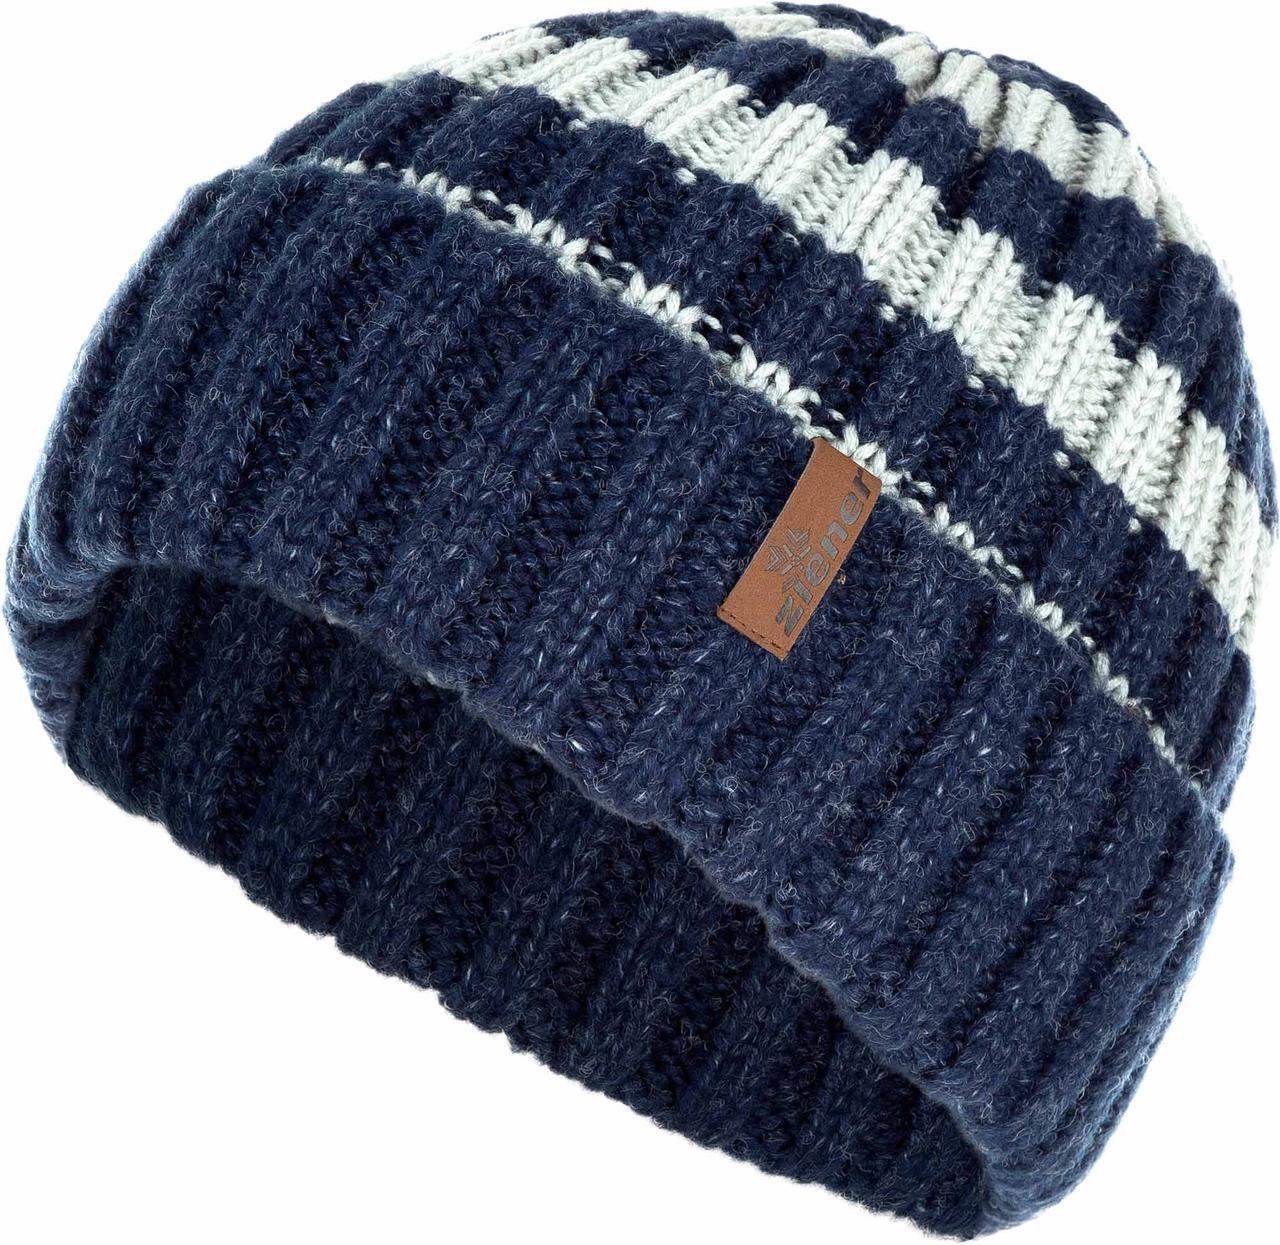 ШАПКА МУЖСКАЯ ZIENER  SM 17-acc 485 hat (170075-47)